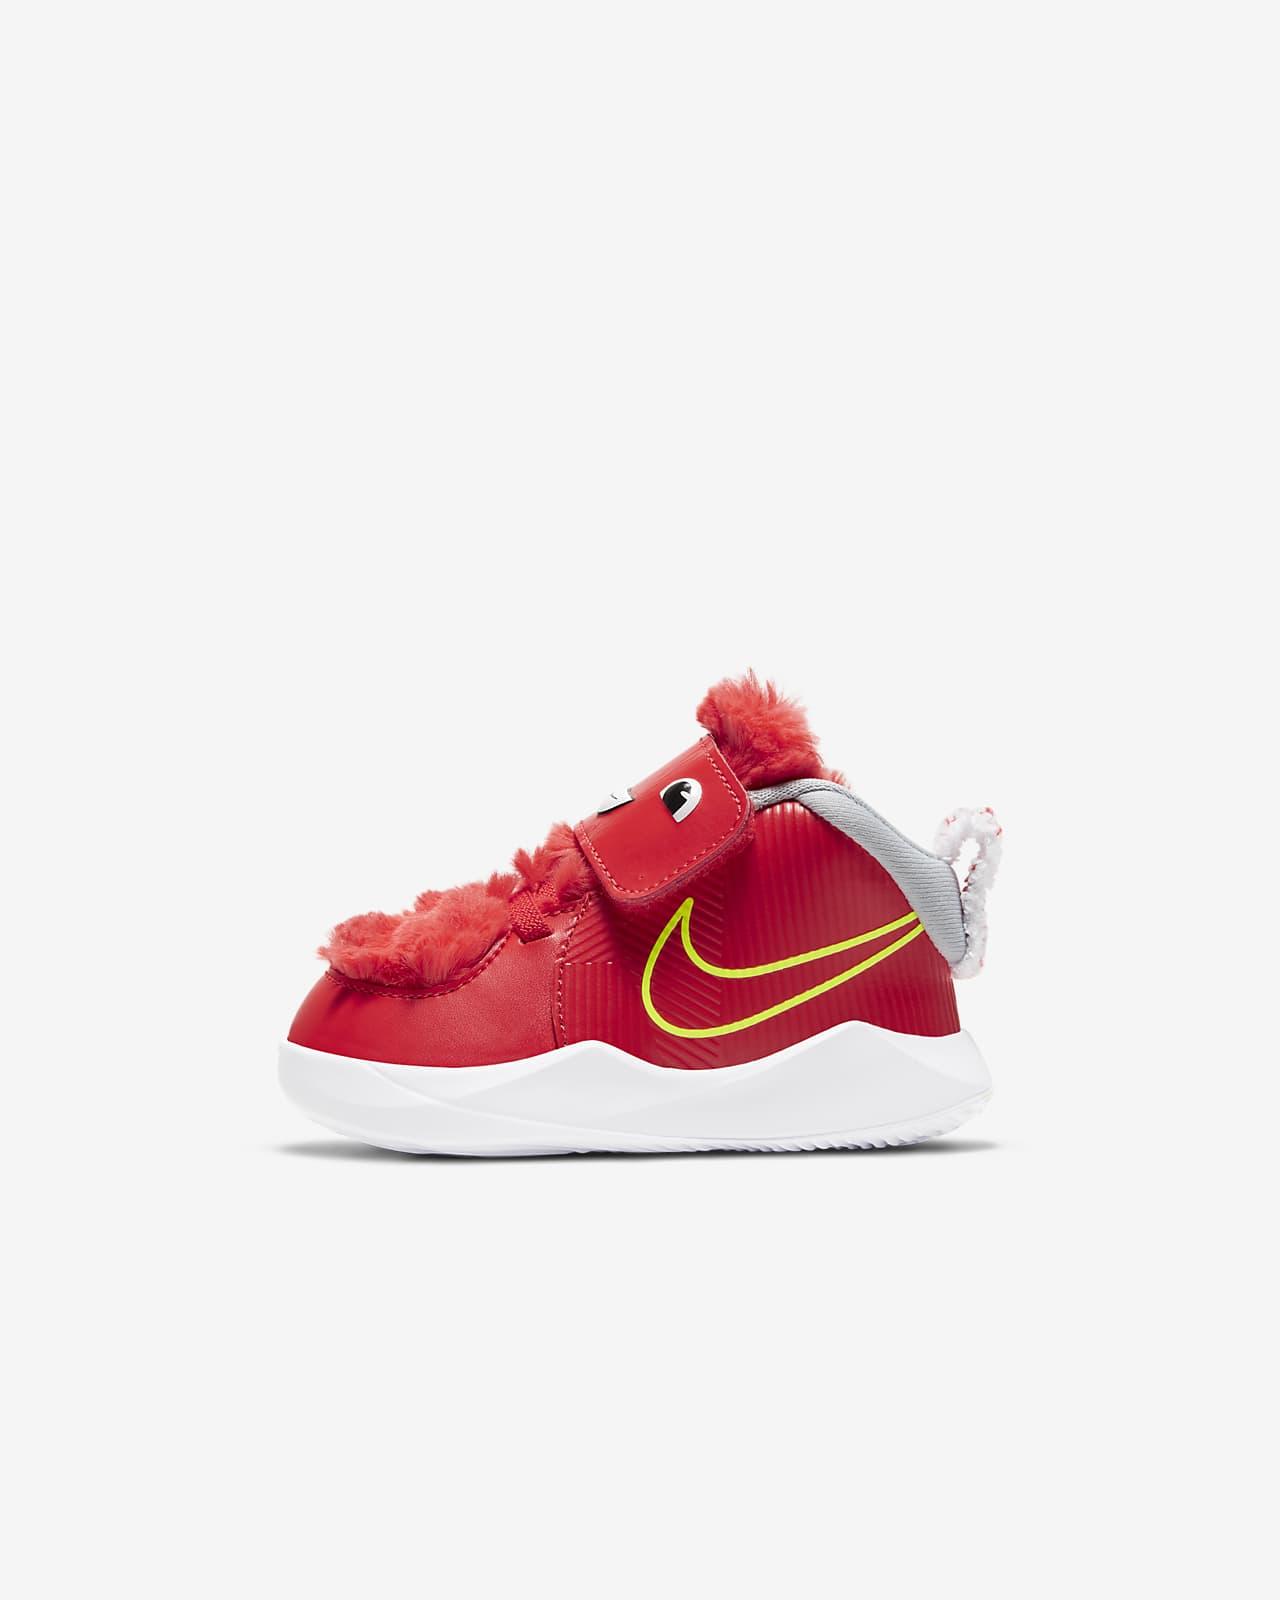 Nike Team Hustle D 9 Lil (TD) 婴童运动童鞋